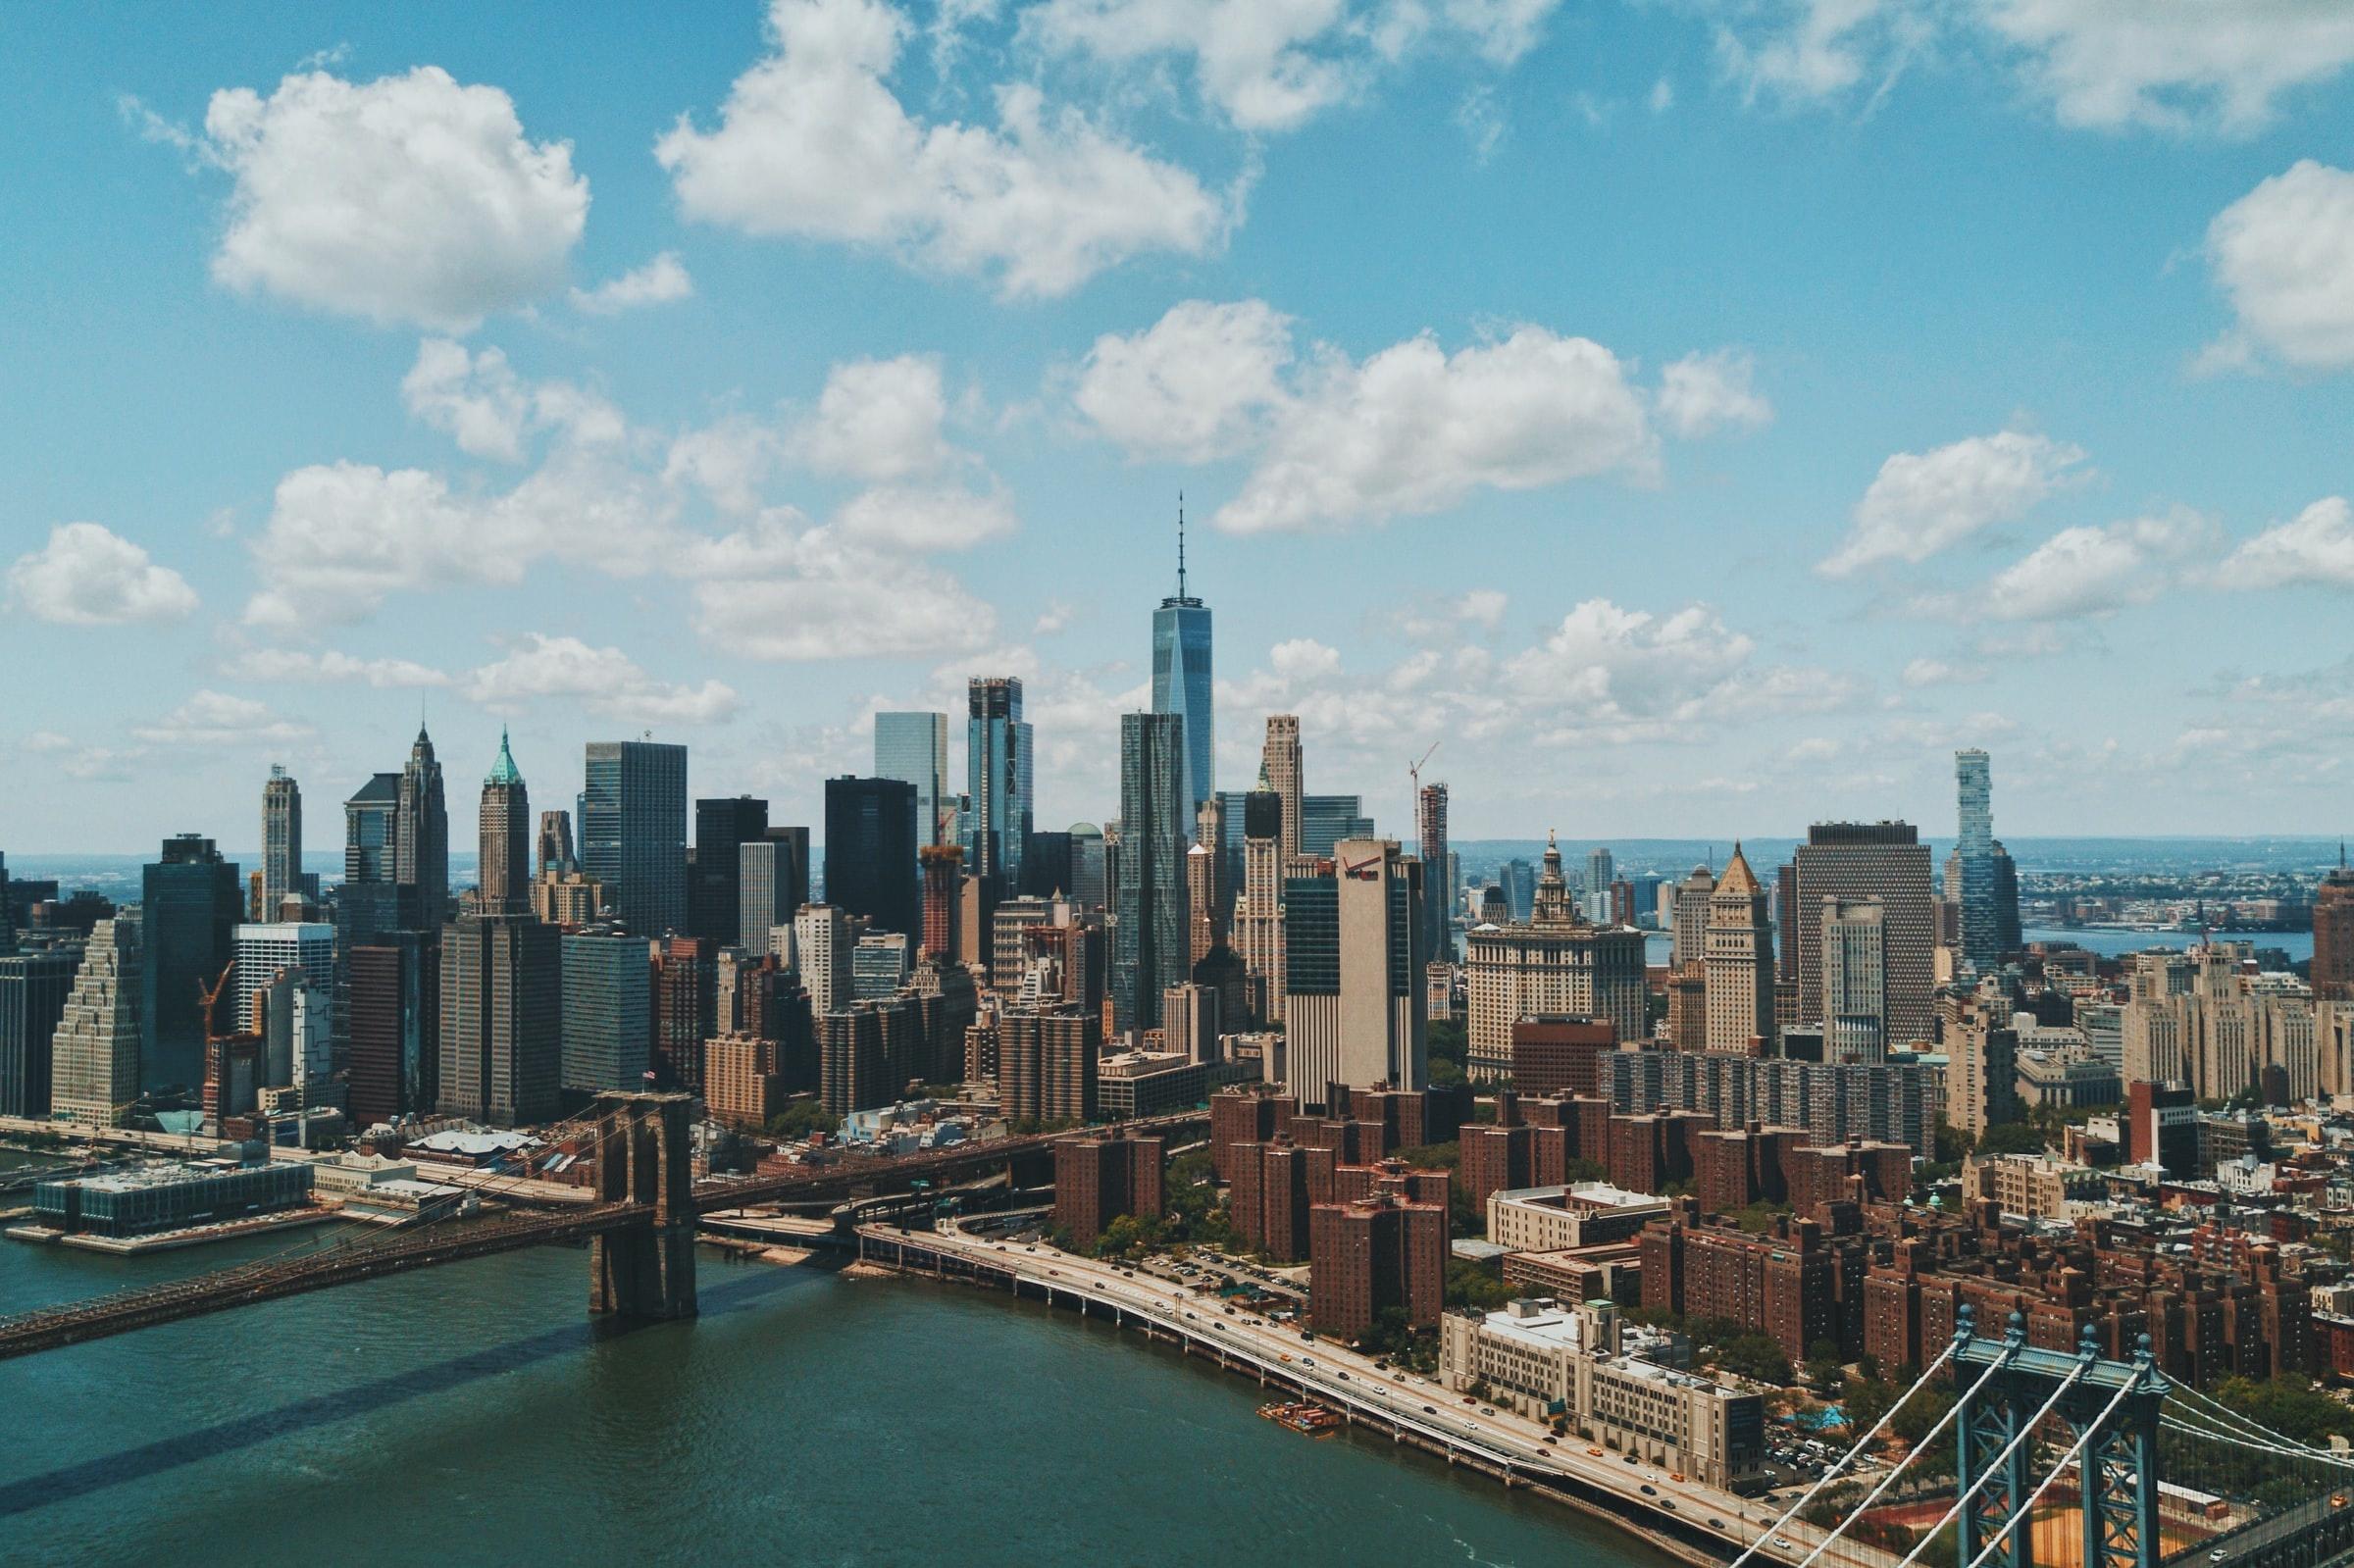 New York, NYC, NY, New York City, YSG Solar